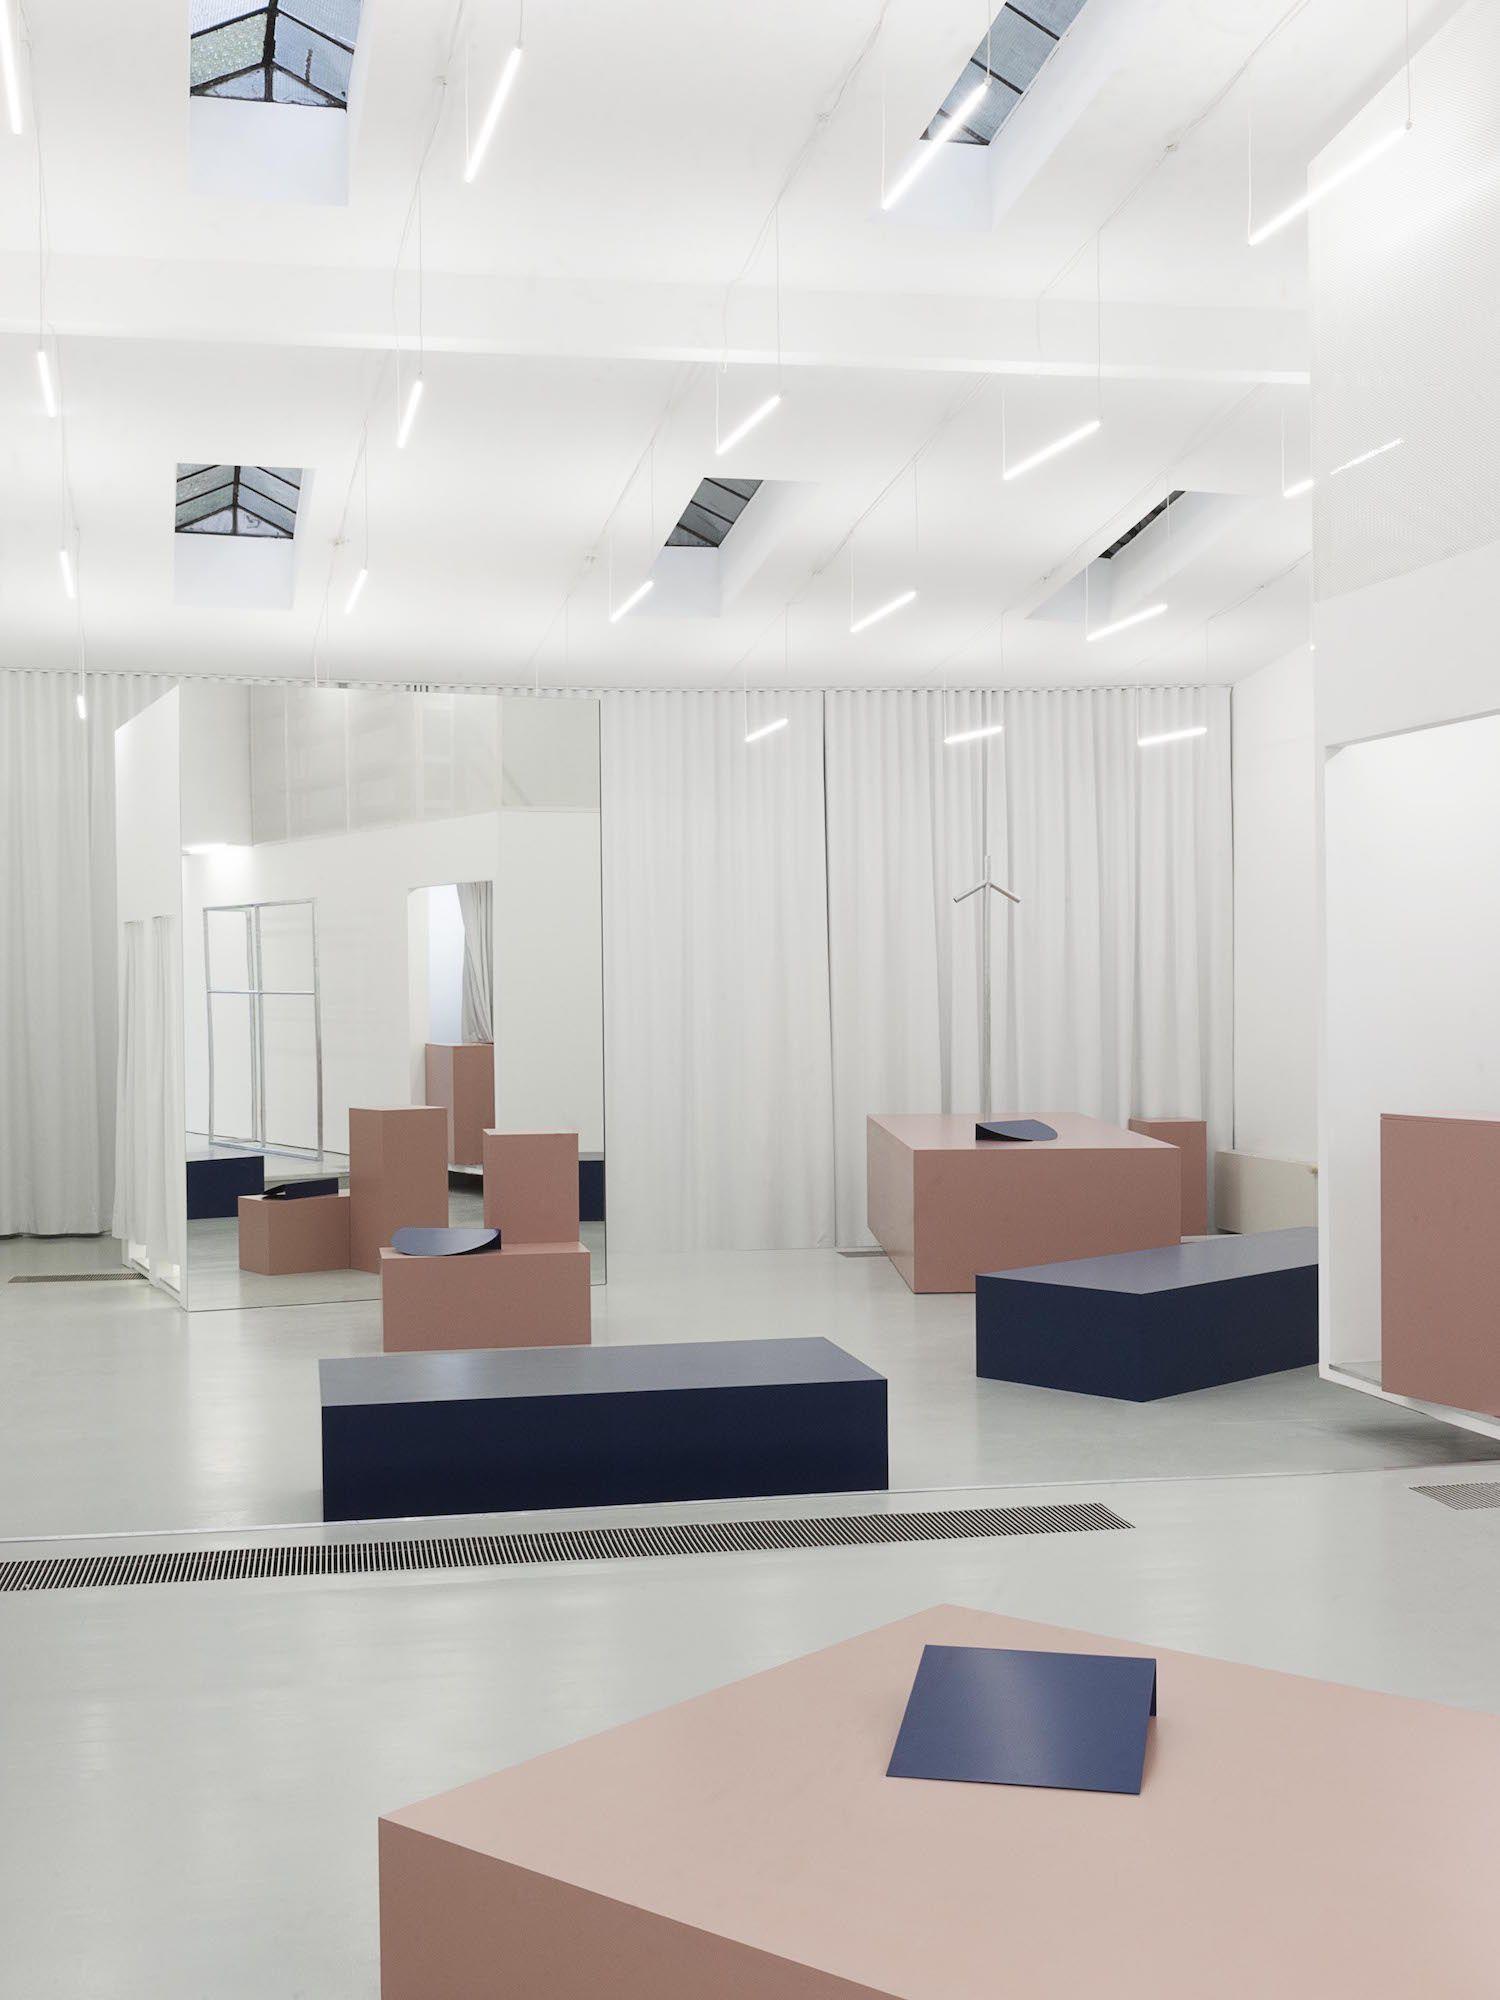 No74 Store · Berlin, Germany (closed Intérieur de magasin  Retail interior